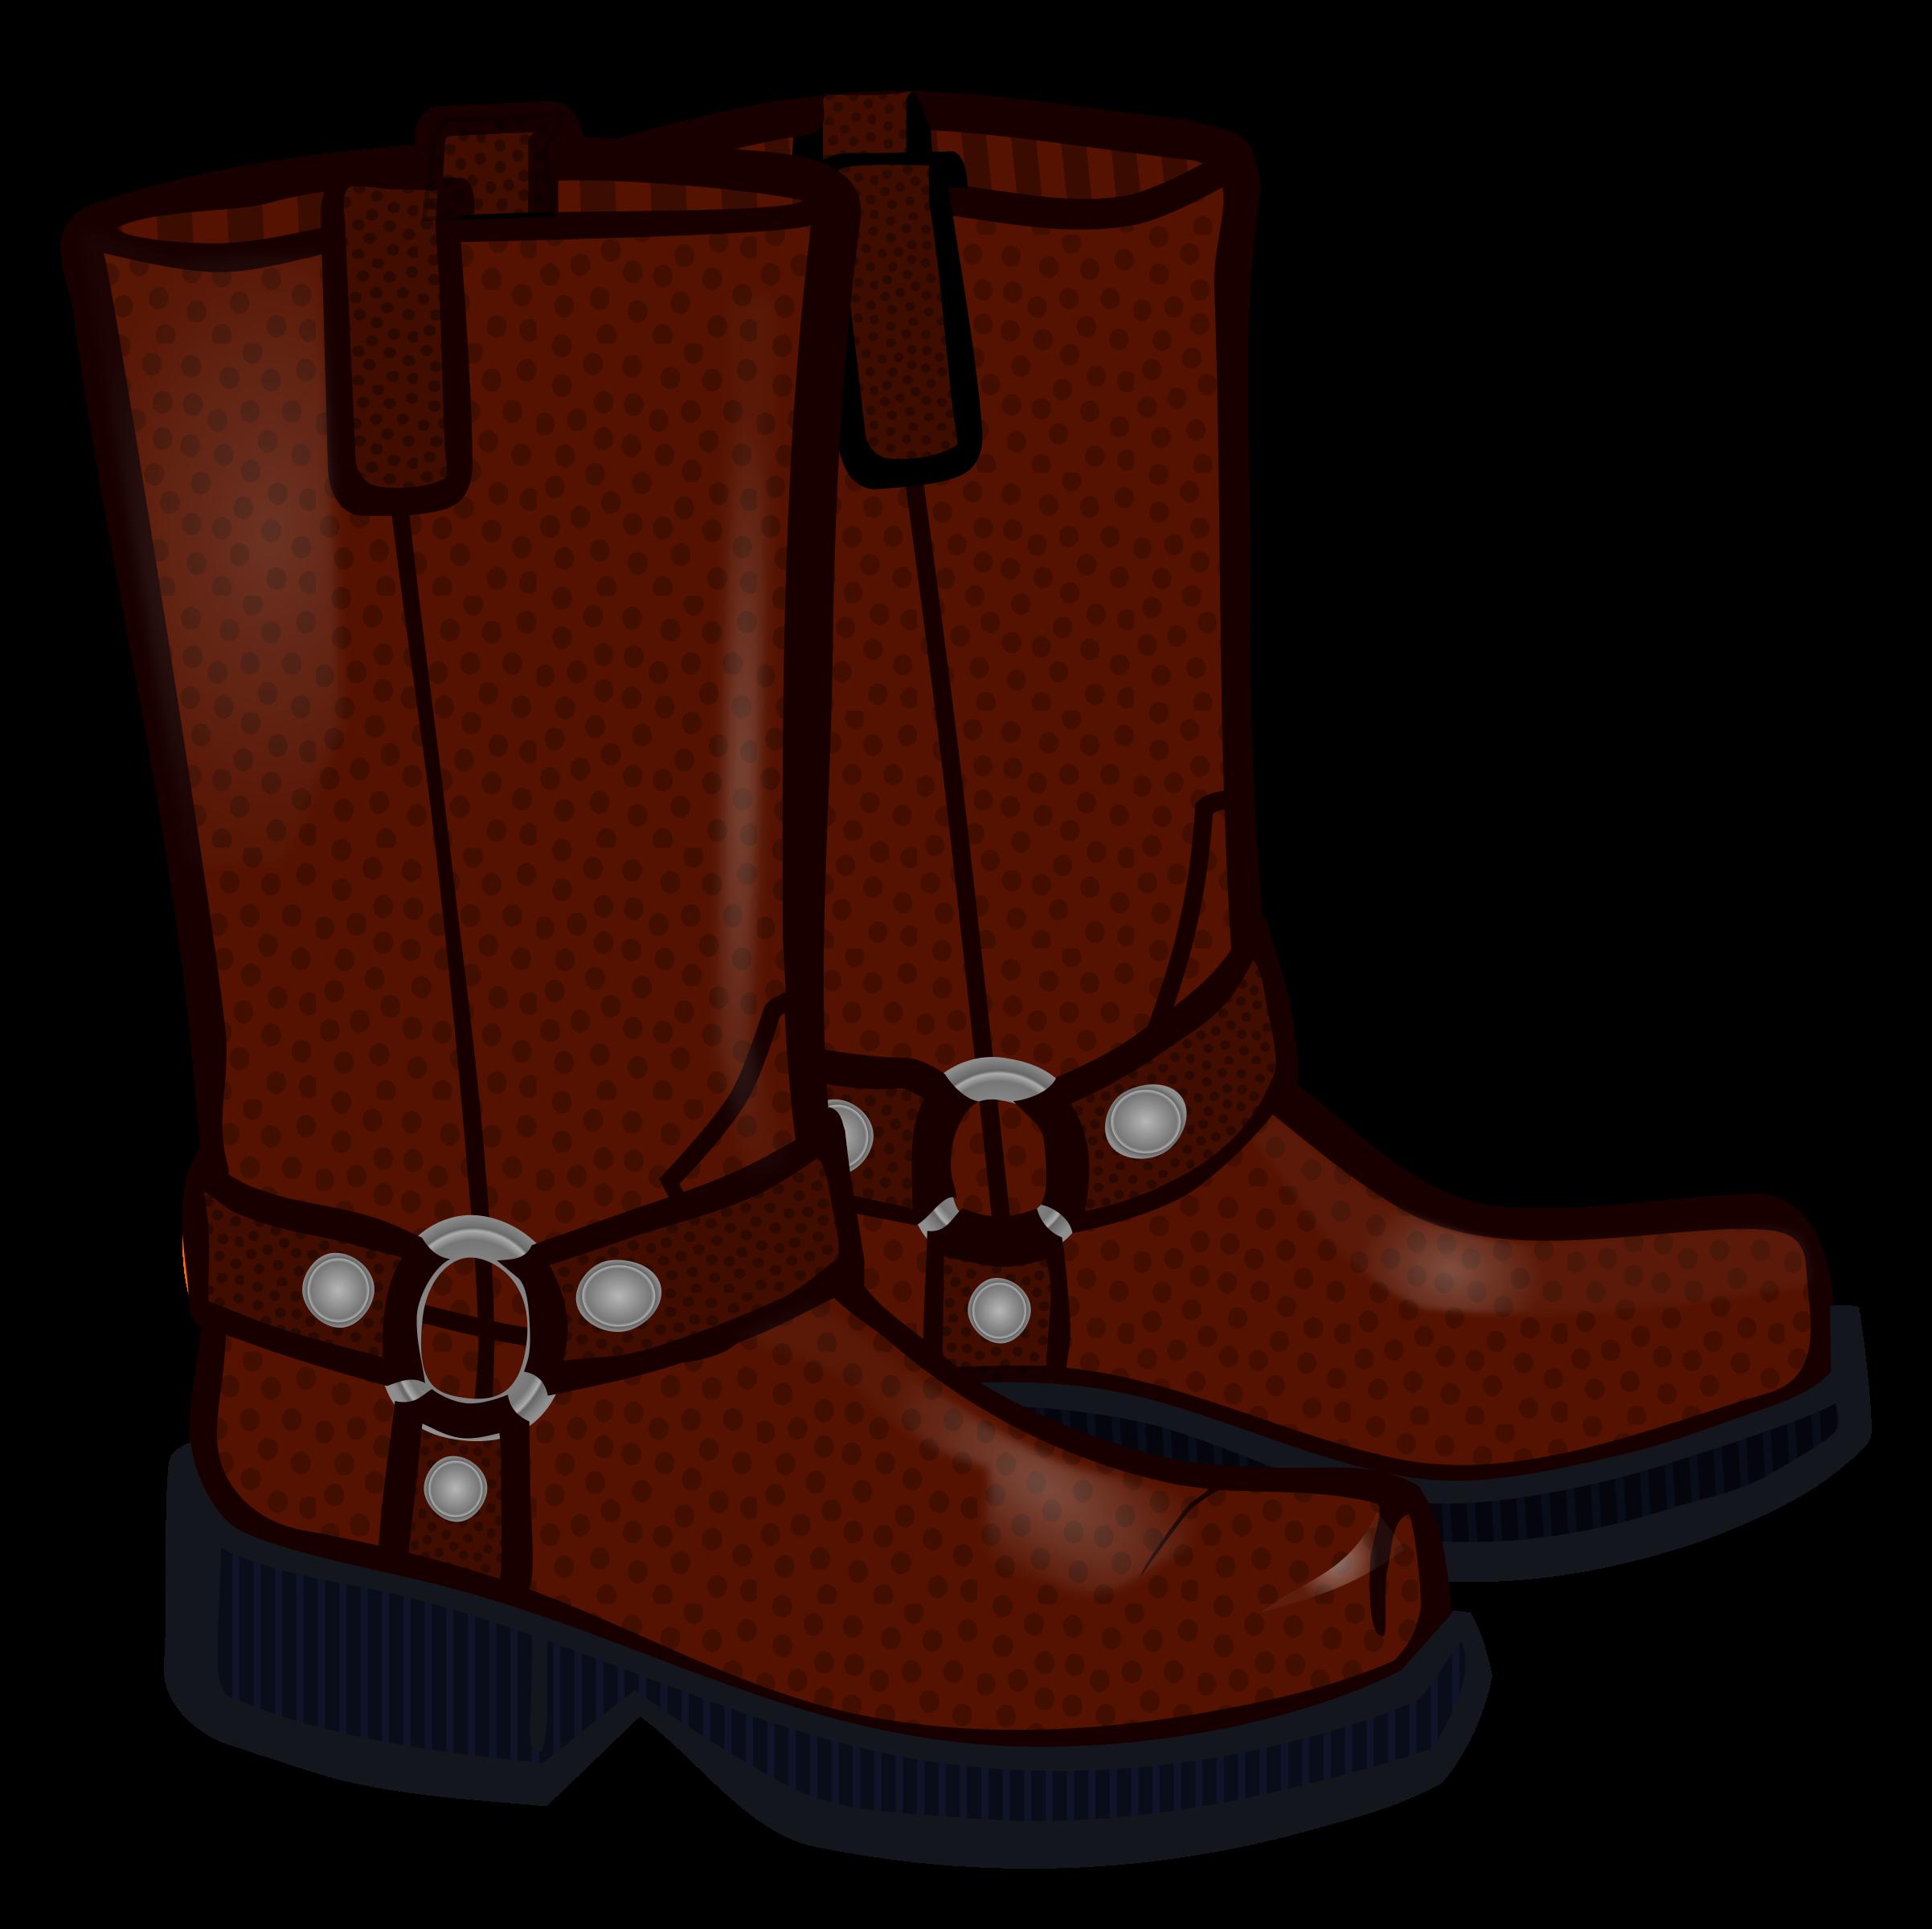 Color hiking book clipart jpg transparent library Boots Clipart (84+) Desktop Backgrounds jpg transparent library